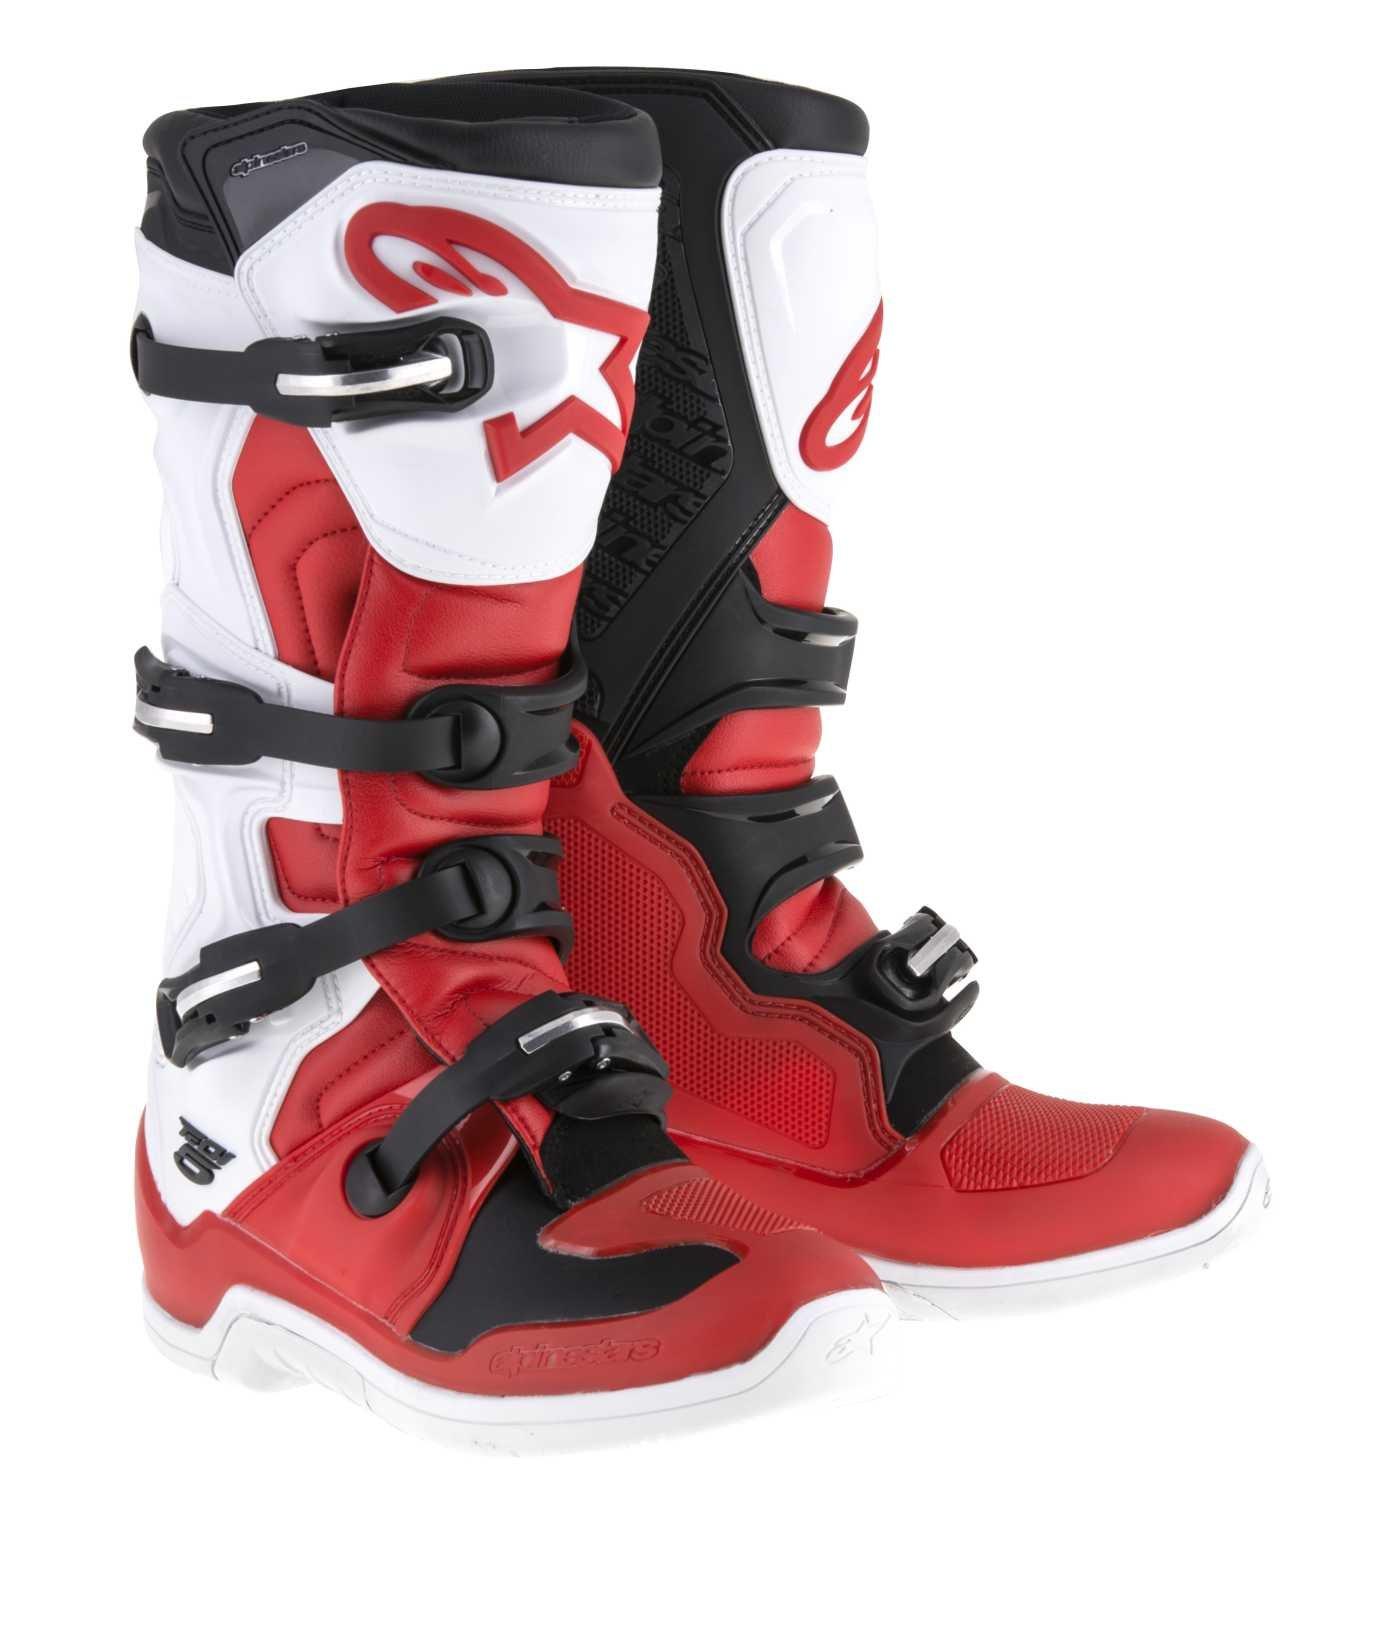 Alpinestars Tech 5 Boots-Red/White/Black-7